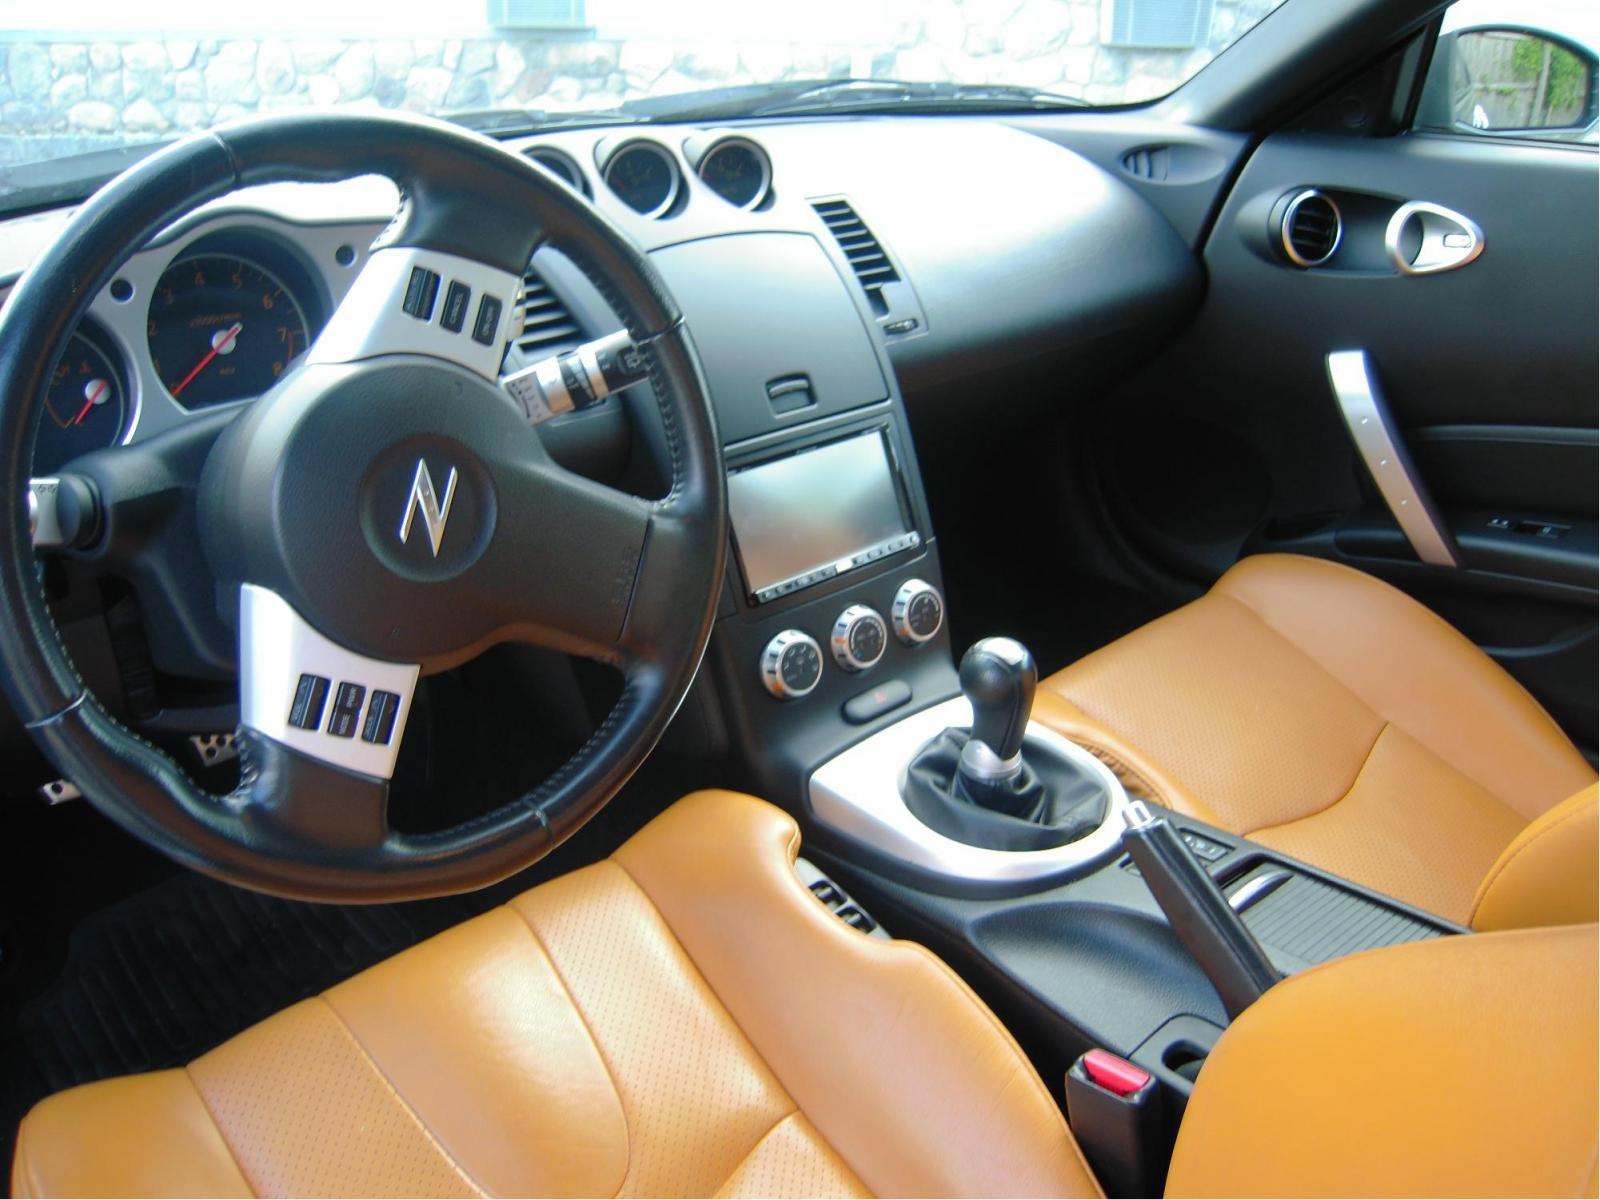 2004 nissan 350z coupe interior choice image hd cars wallpaper 2004 nissan 350z coupe interior images hd cars wallpaper 2004 nissan 350z coupe interior image collections vanachro Choice Image